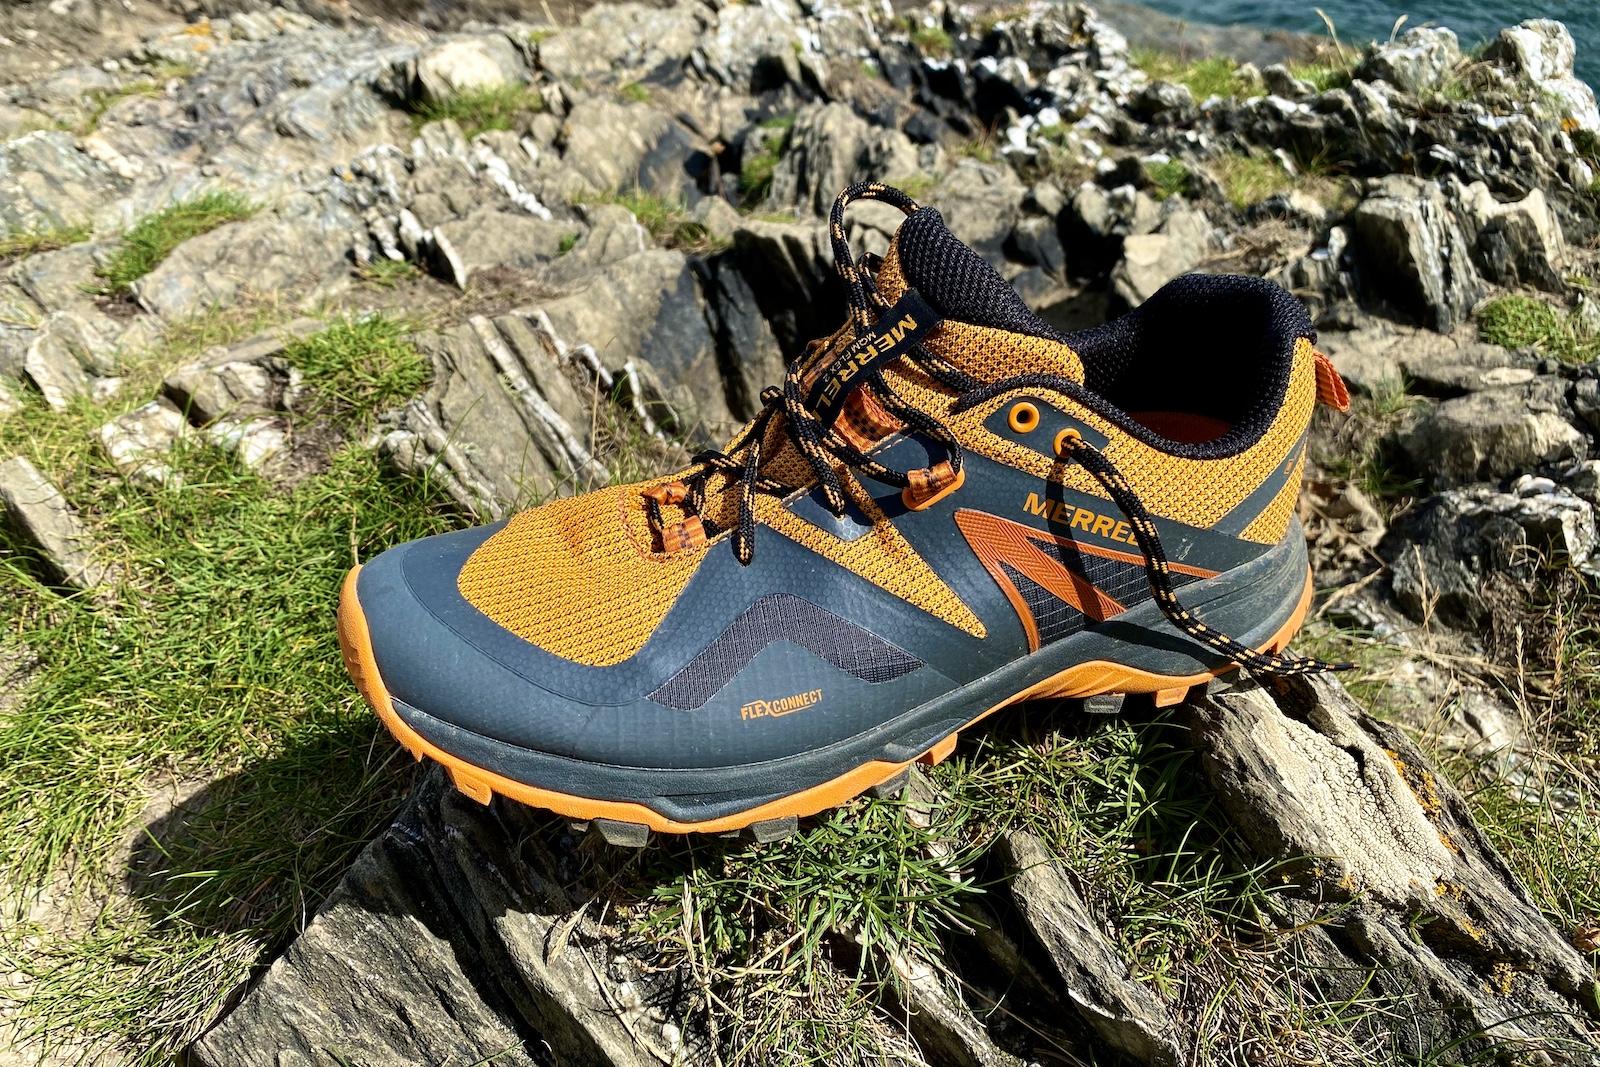 Merrell MQM Flex 2.0 GORE-TEX Shoes Review - Tim Wiggins